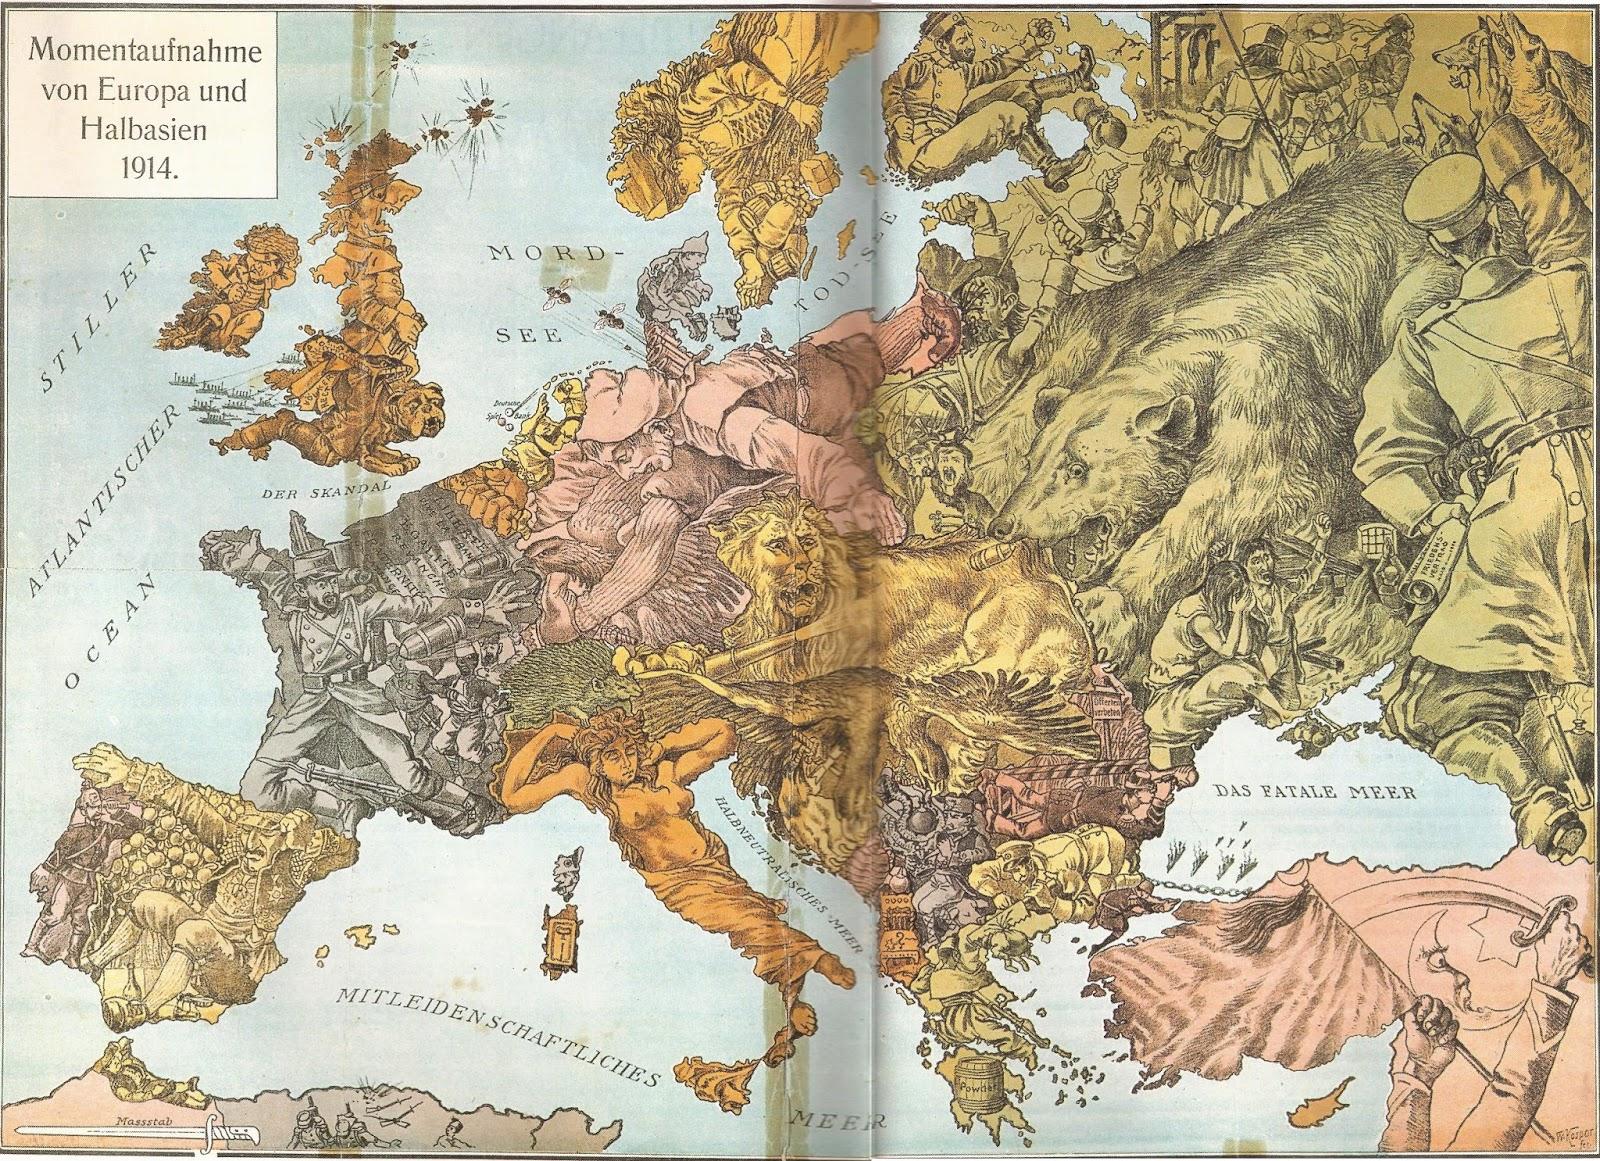 WWI satirical map of Europe